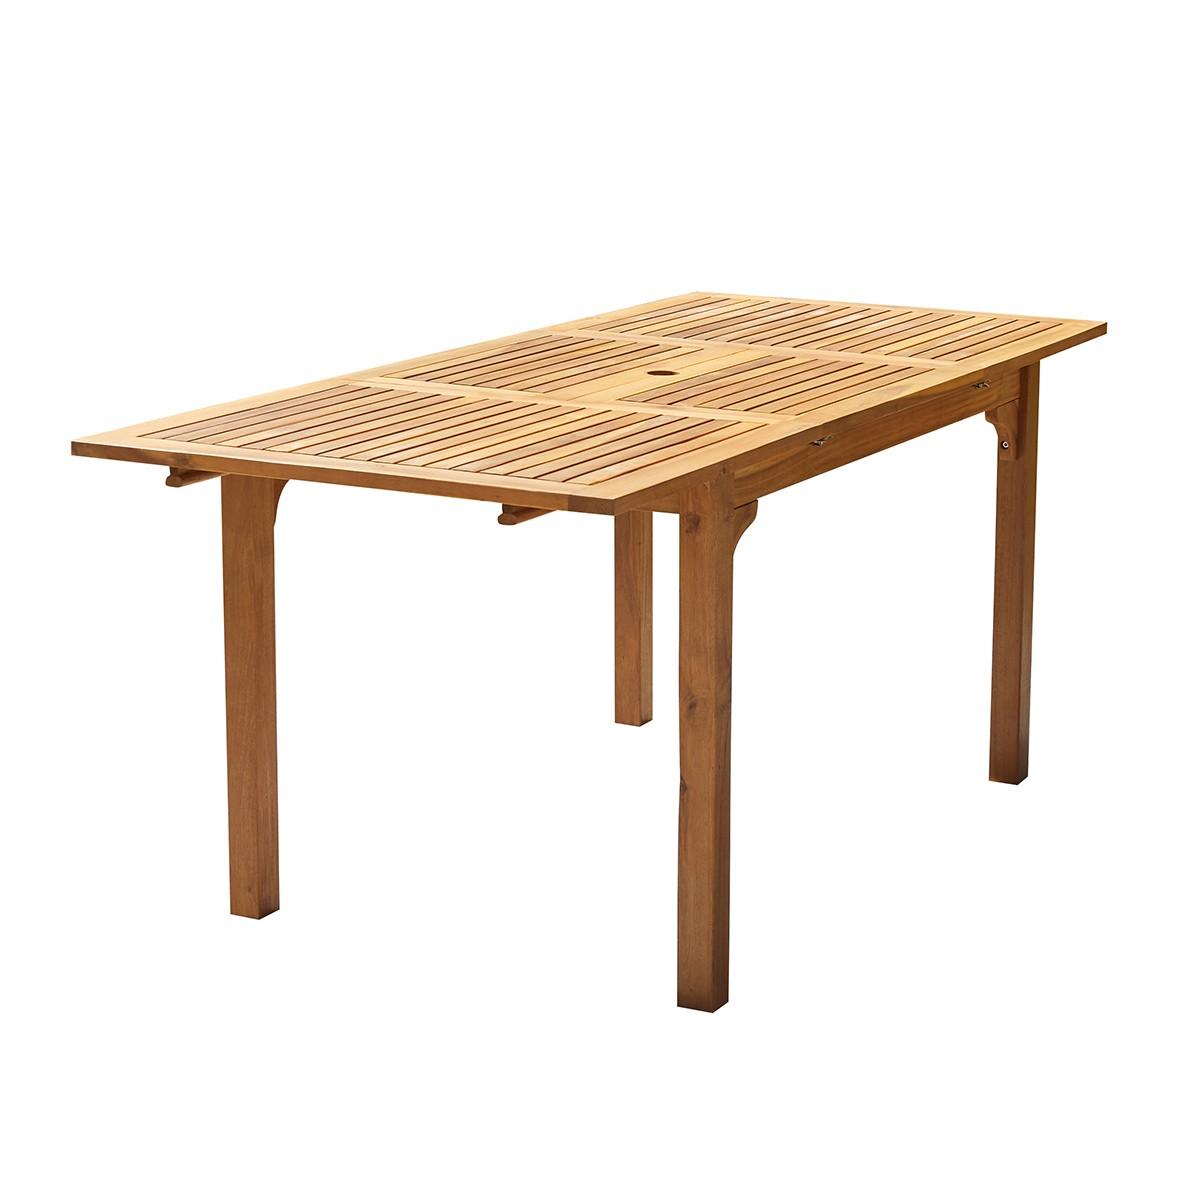 Table de jardin extensible en acacia 4 personnes